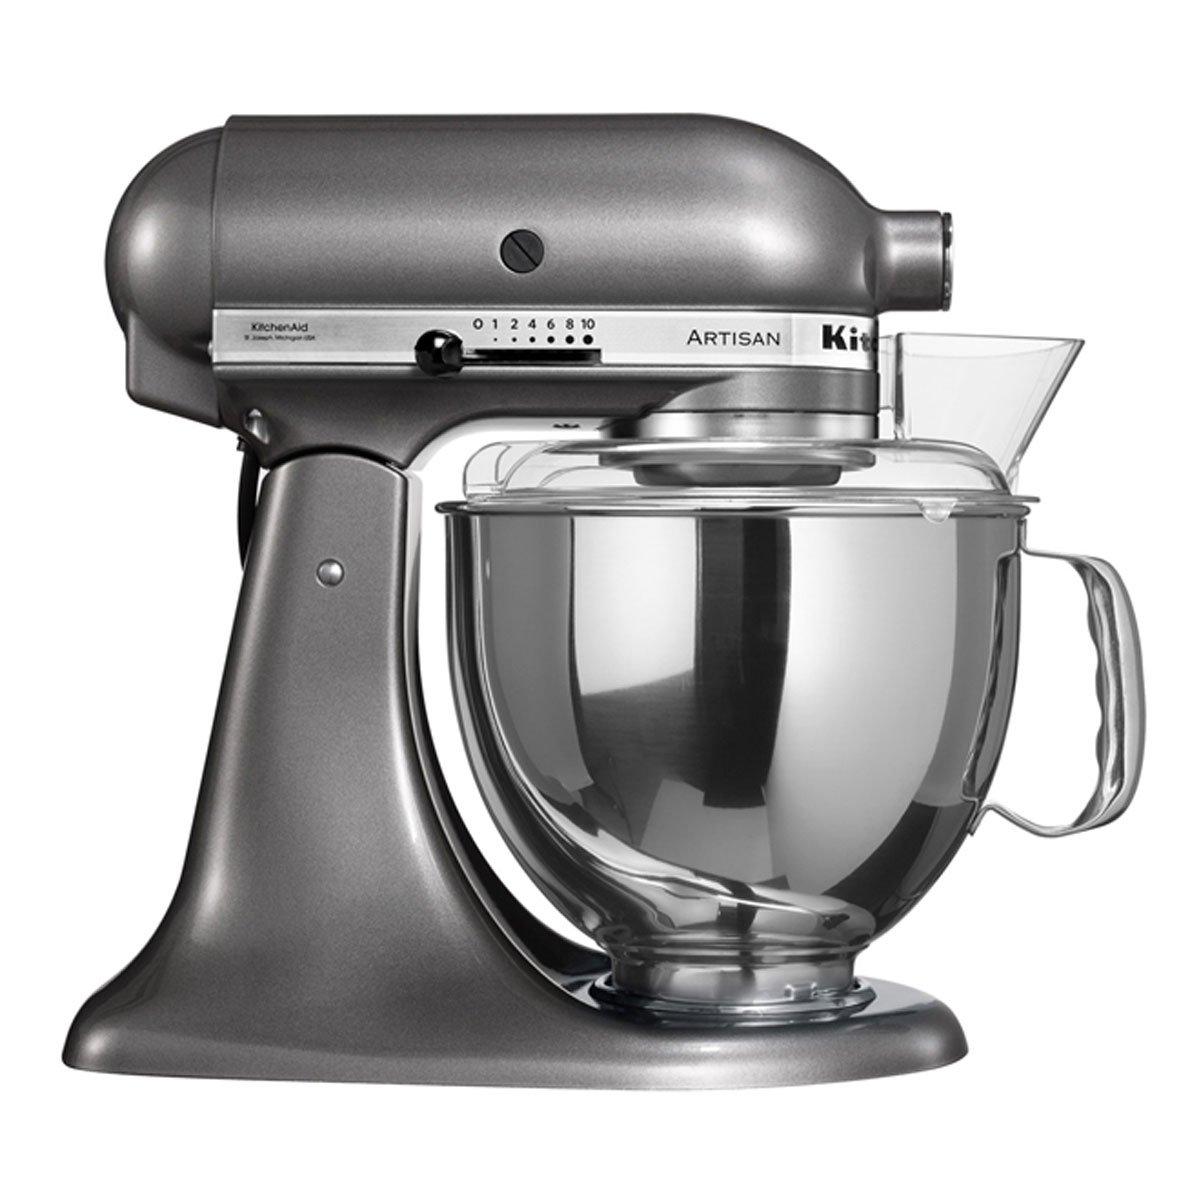 KitchenAid-5KSM150PSEMS-Kchenmaschine-Edelstahl-48-liters-Silber